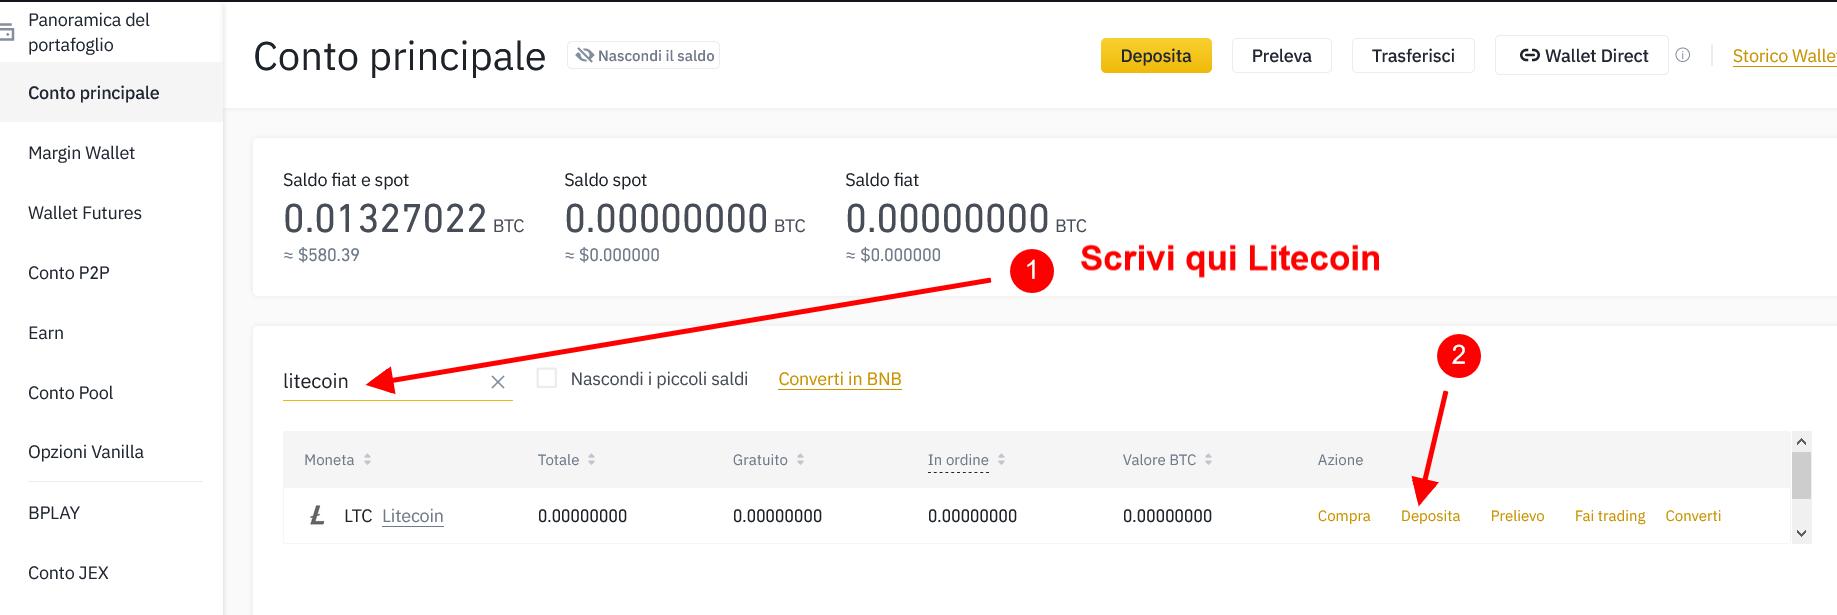 Cerca Litecoin e clicca su deposita